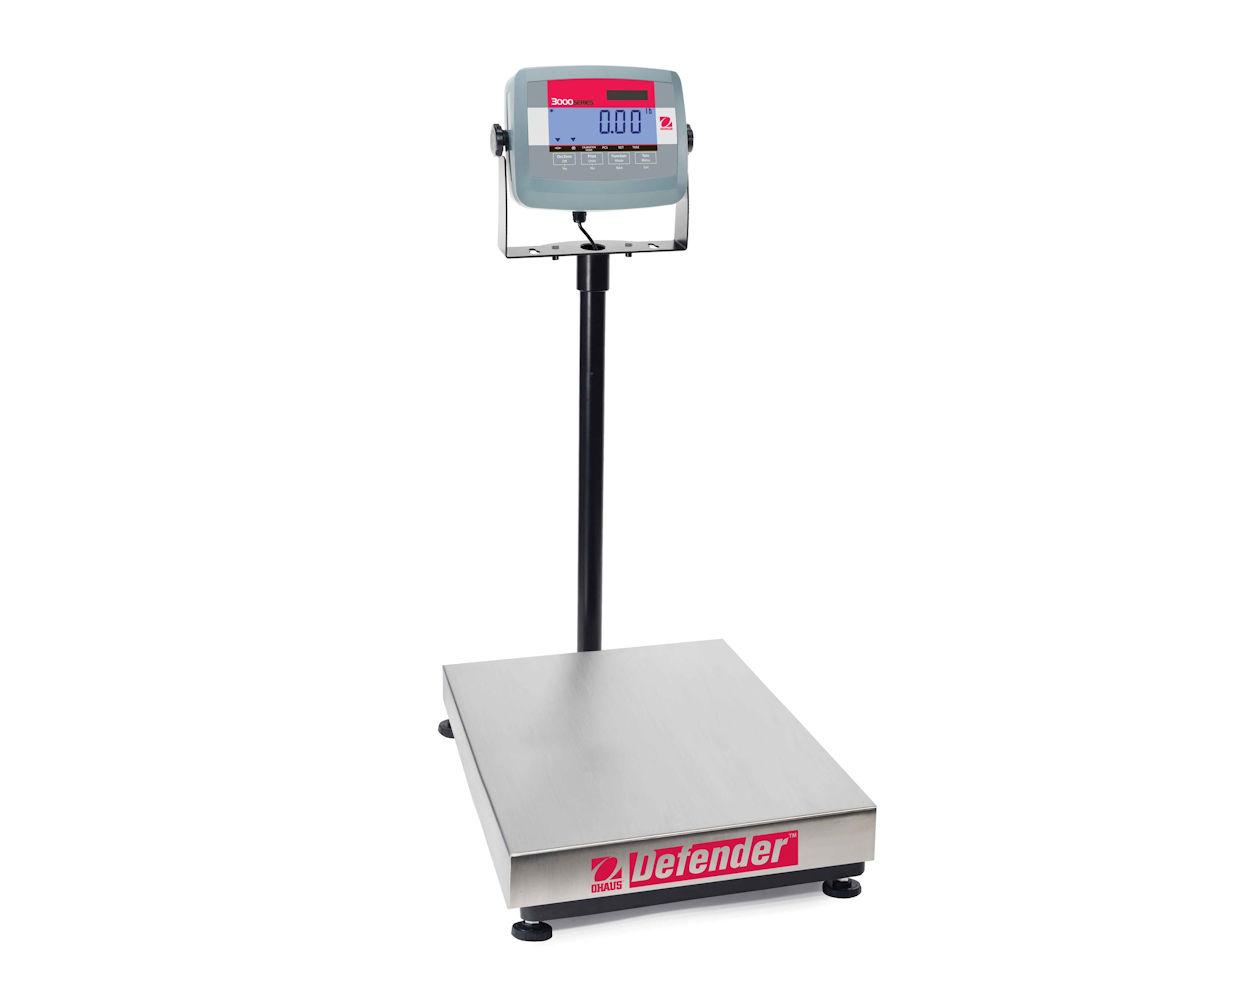 Ohaus Defender3000 kontrollvekt,  30kg/5g